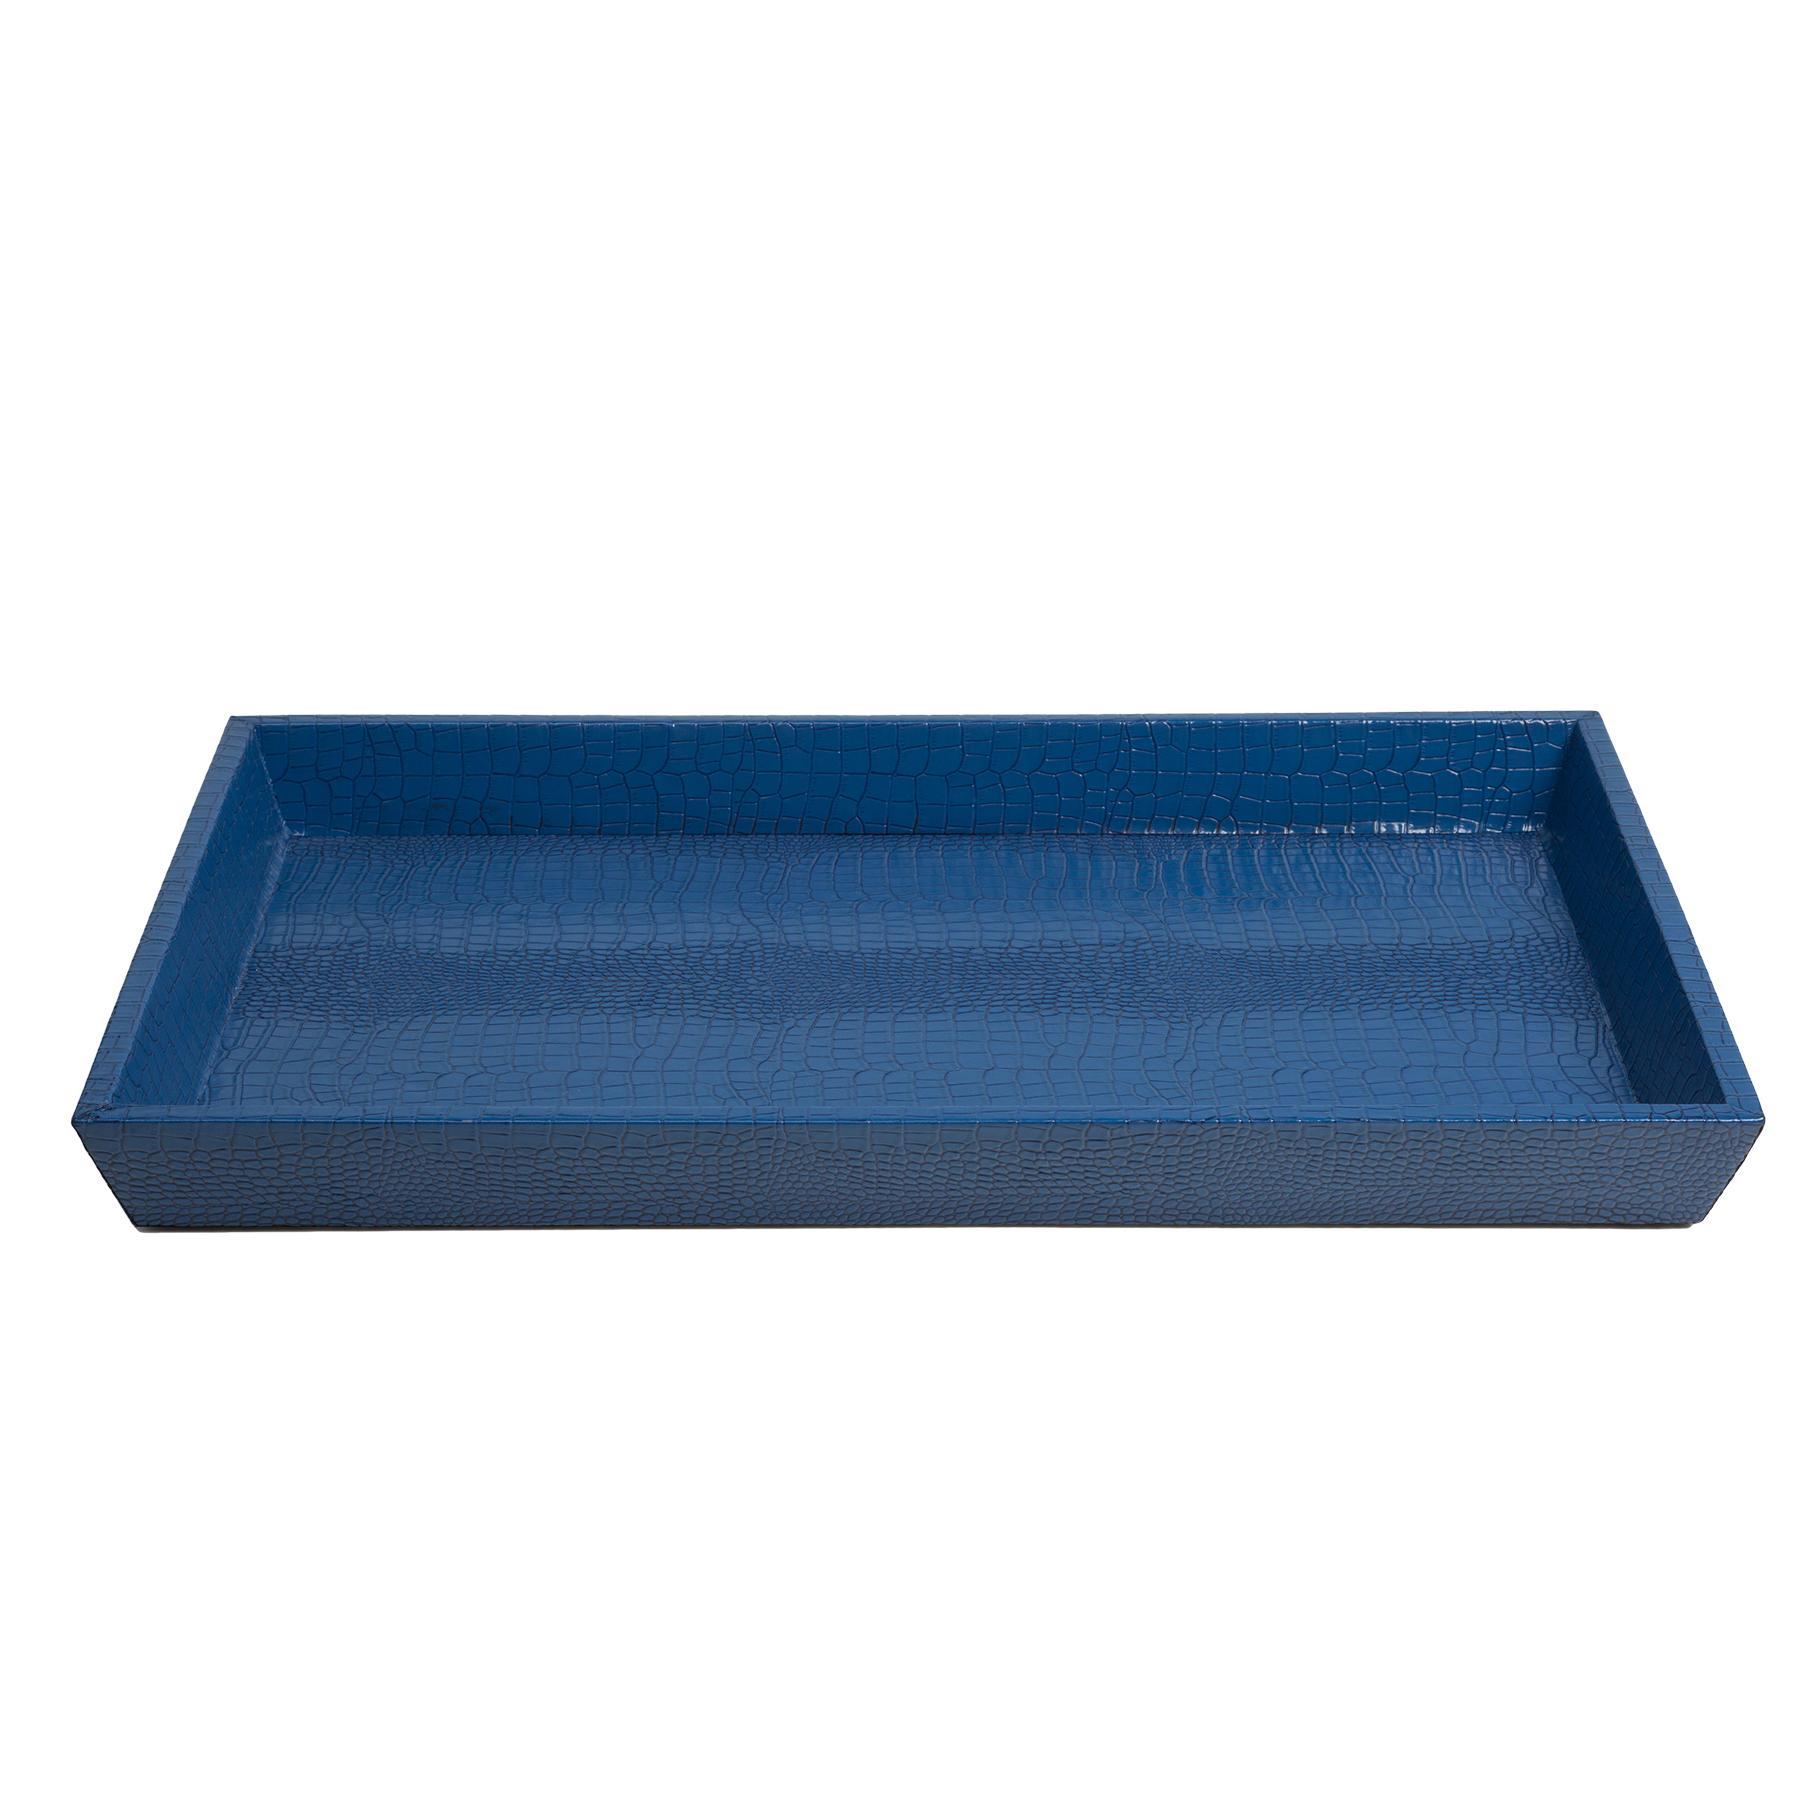 Декоративный поднос Kalipso синего цвета